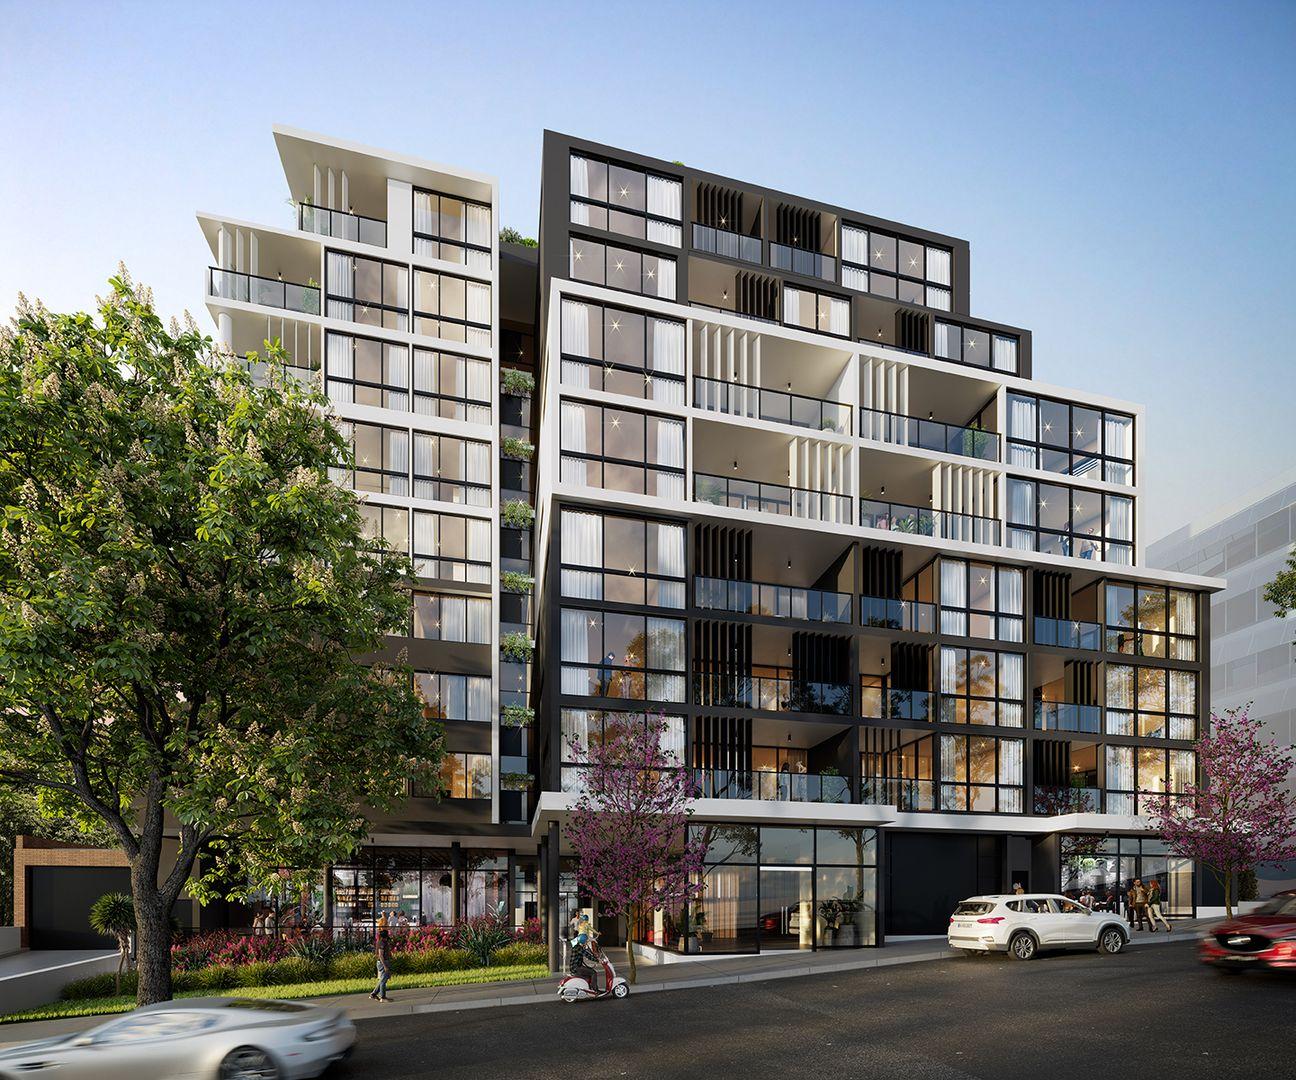 49 - 51 Denison Street, Wollongong, NSW 2500, Image 0